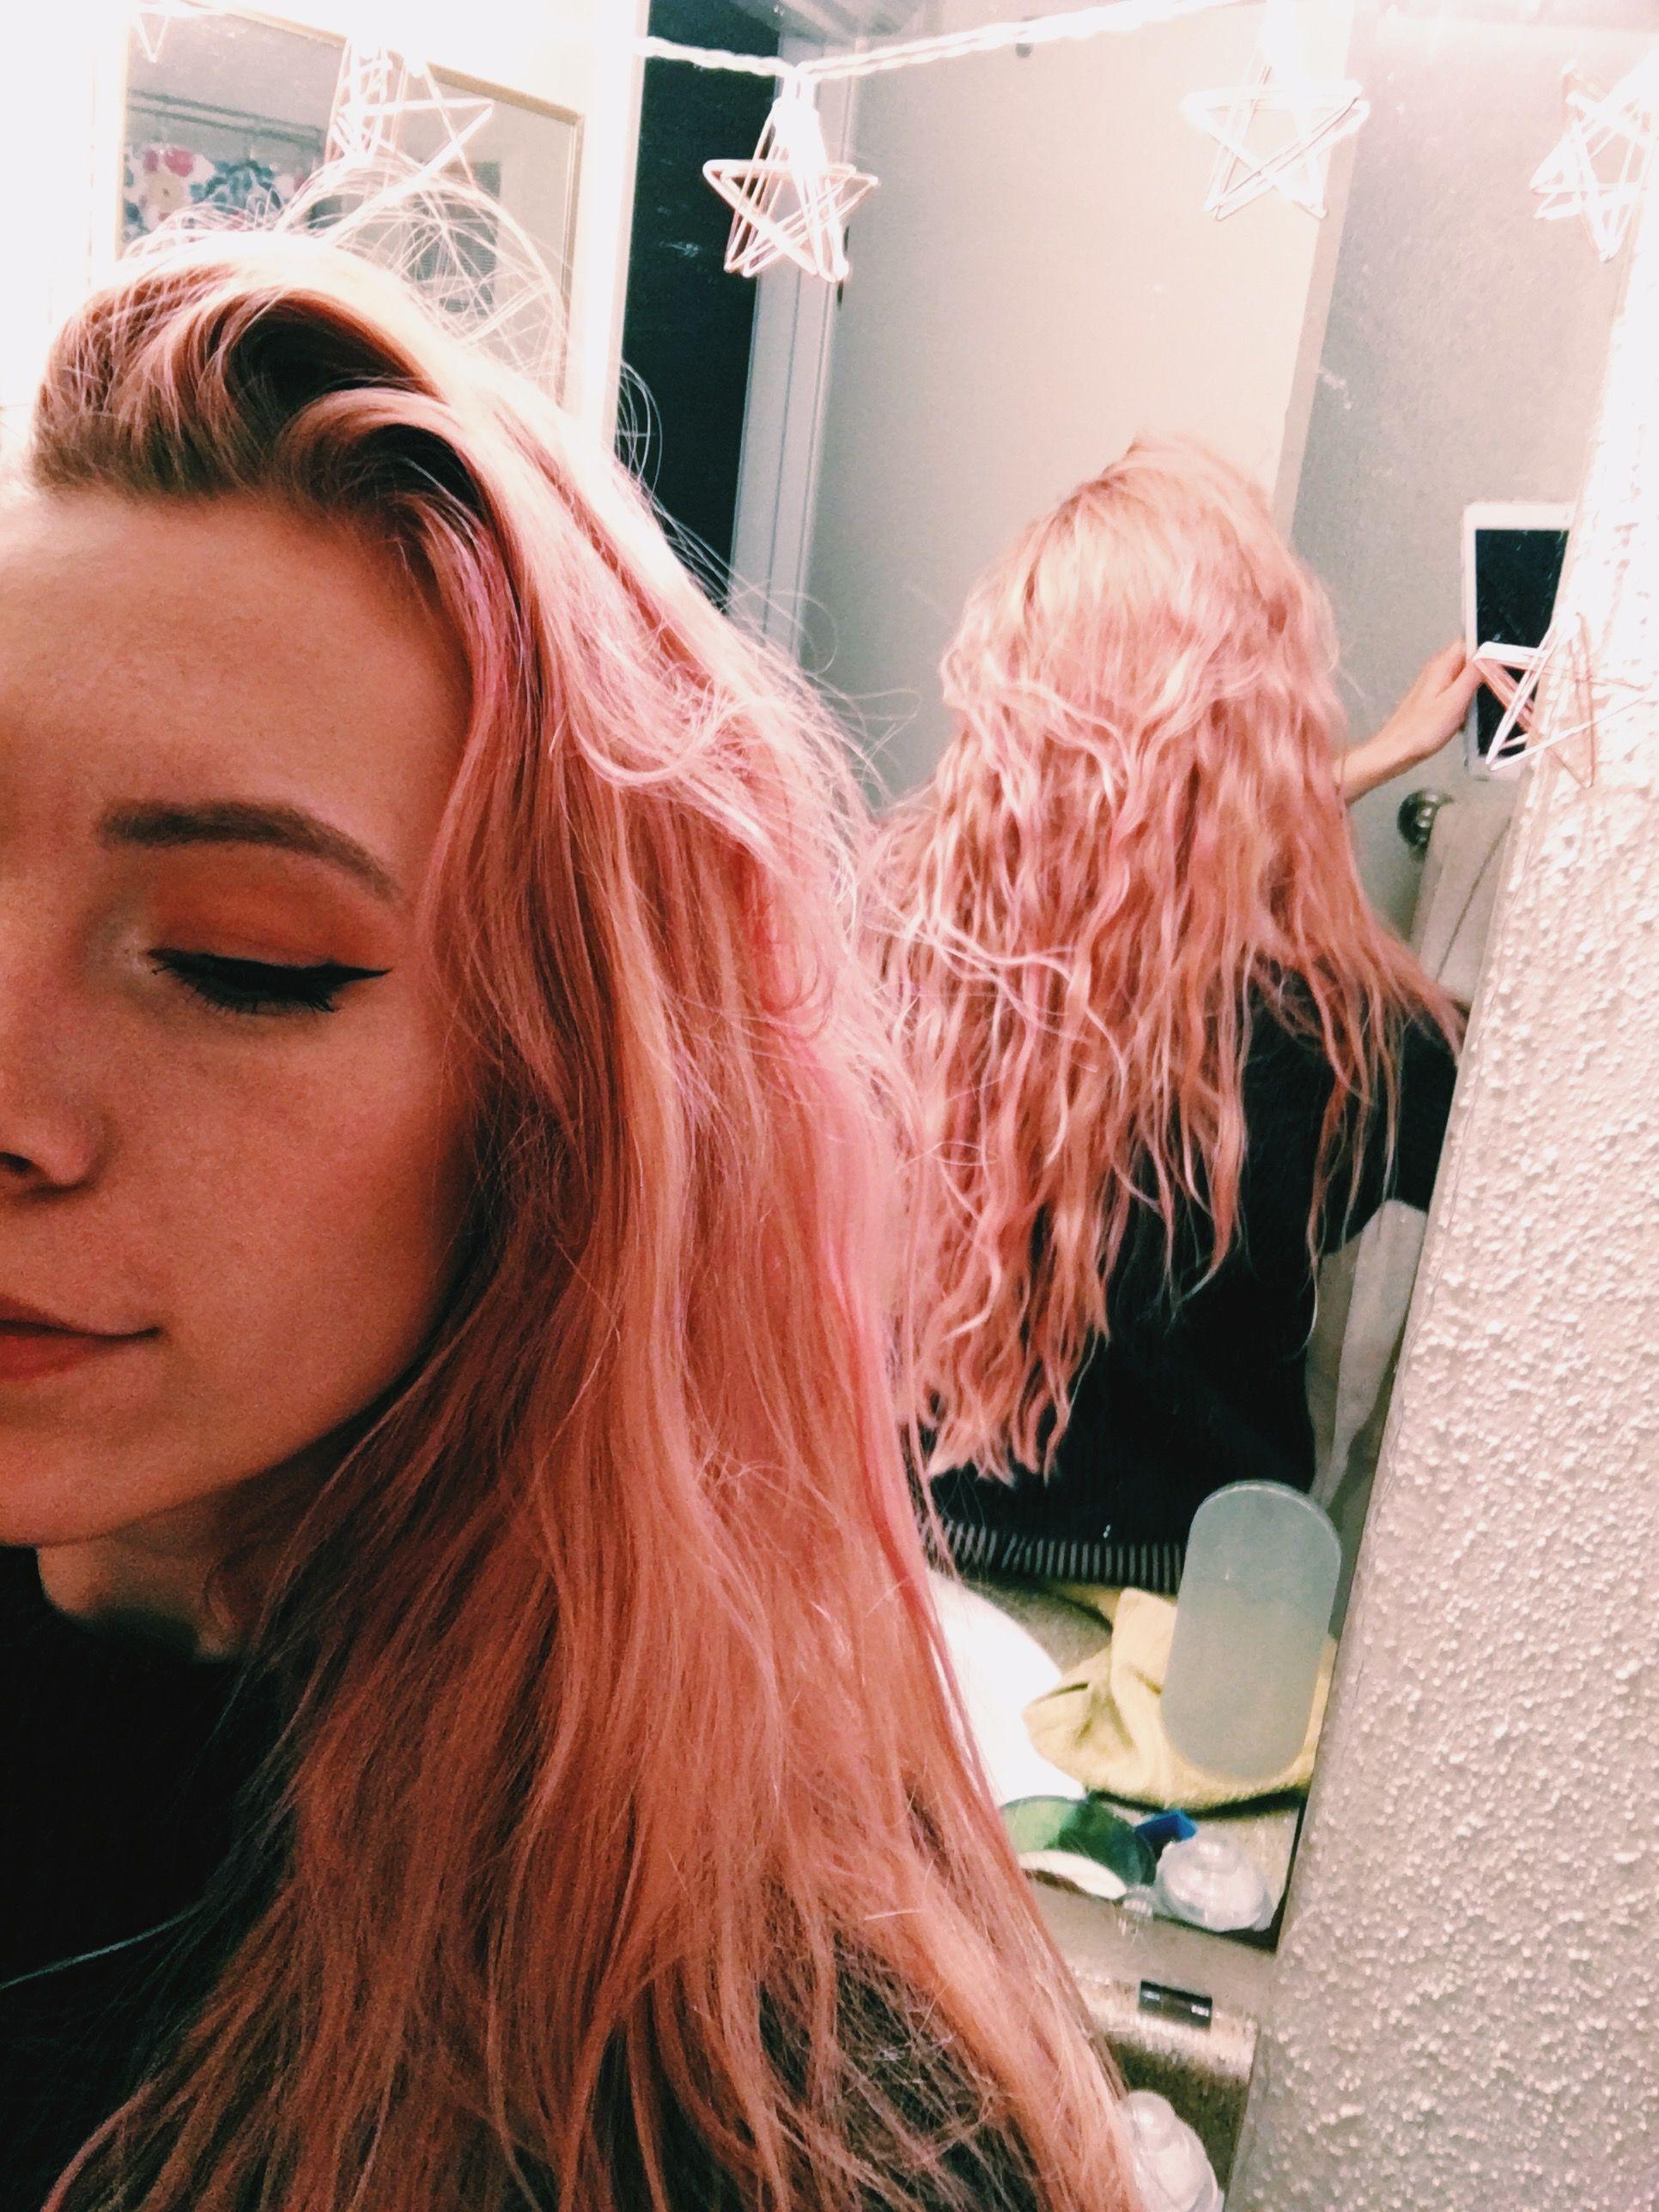 Pastel Pink Hair With Splat Peach Fuzz Mermaid Pinkhair Rosegoldhair Mermaidhair Longhair Pastel Pastelaesthetic Aesth Pastel Pink Hair Hair Pink Hair